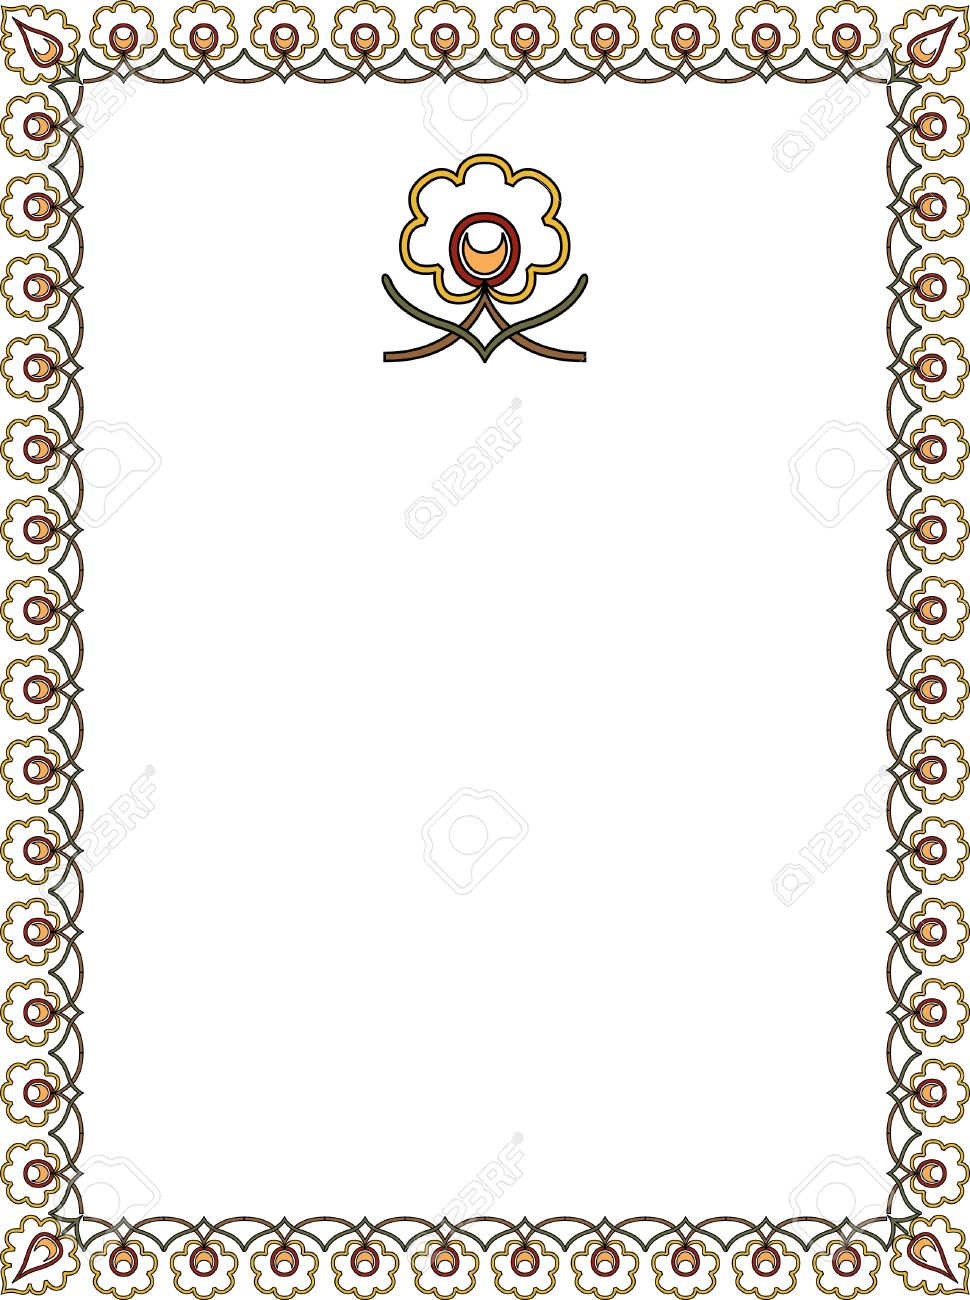 Simple Outline Frame Cotton Plant Royalty Free Cliparts, Vectors ...